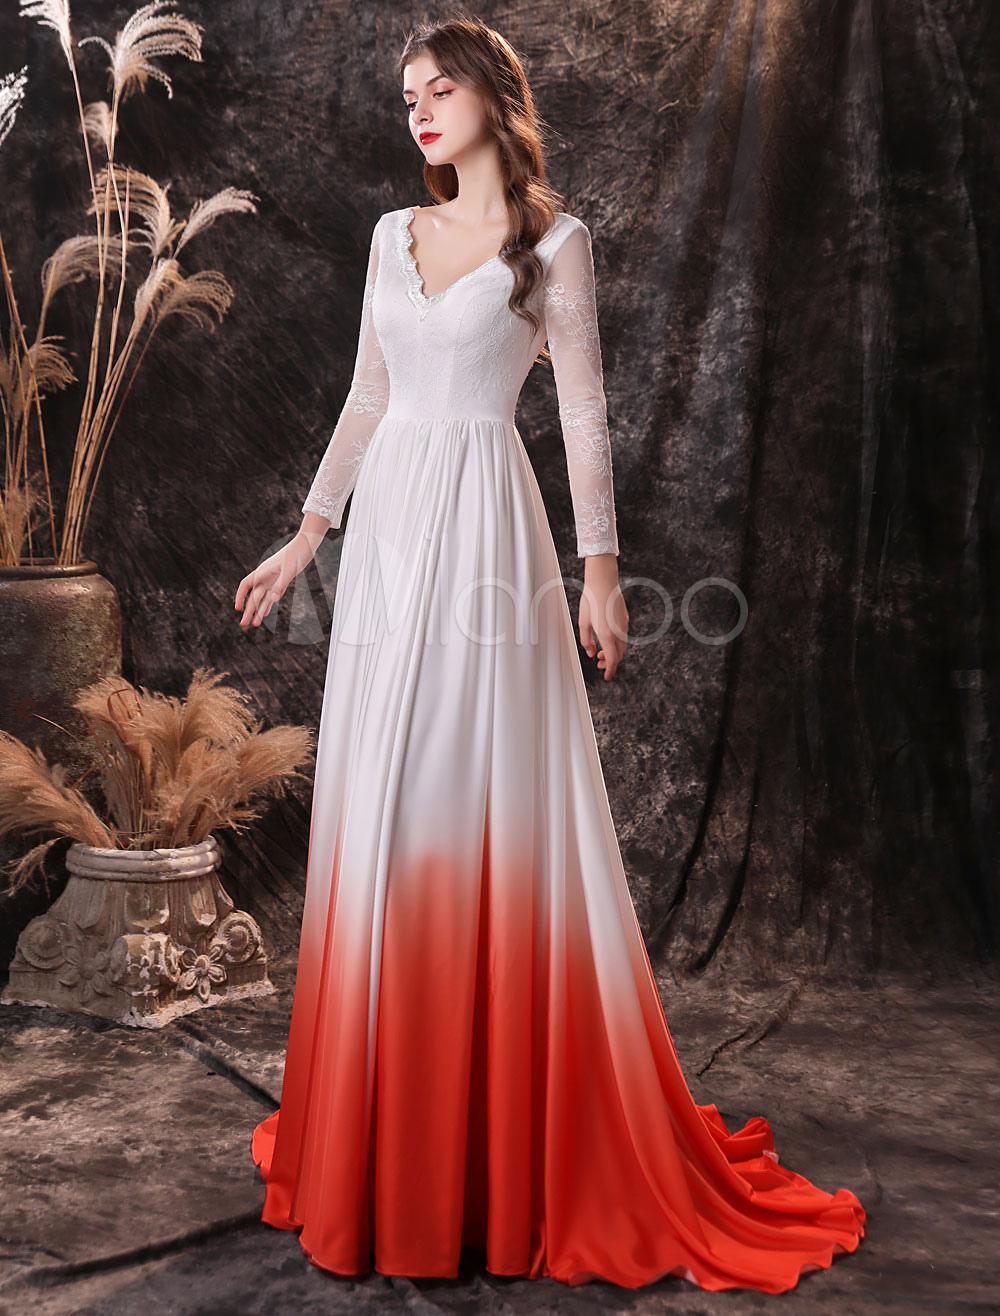 abendkleid orange rot a linie v hals chiffon mit zug social party kleider  lang festzug kleid